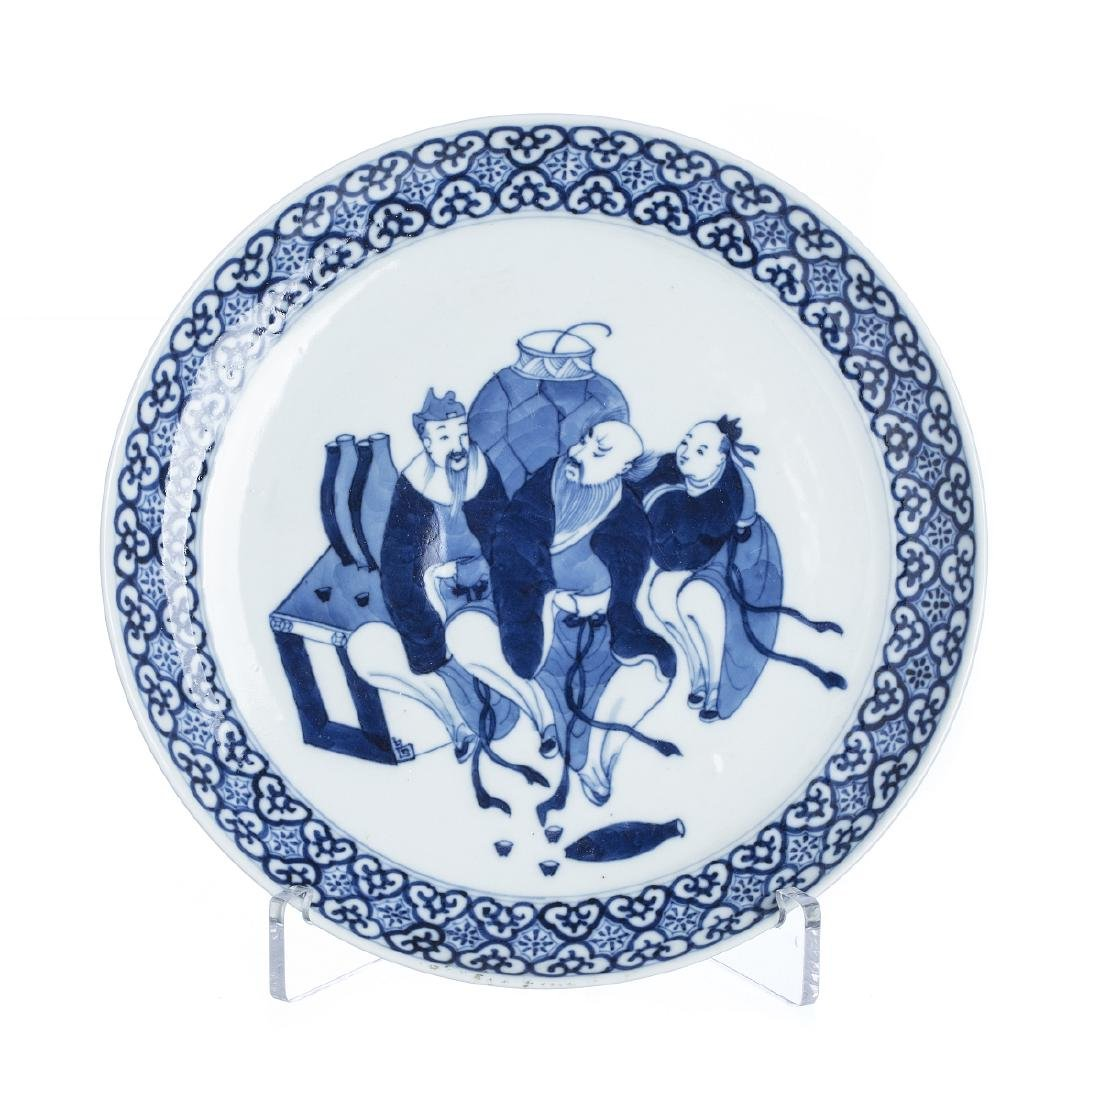 Plate 'Dignitaries' in chinese porcelain, Guangxu